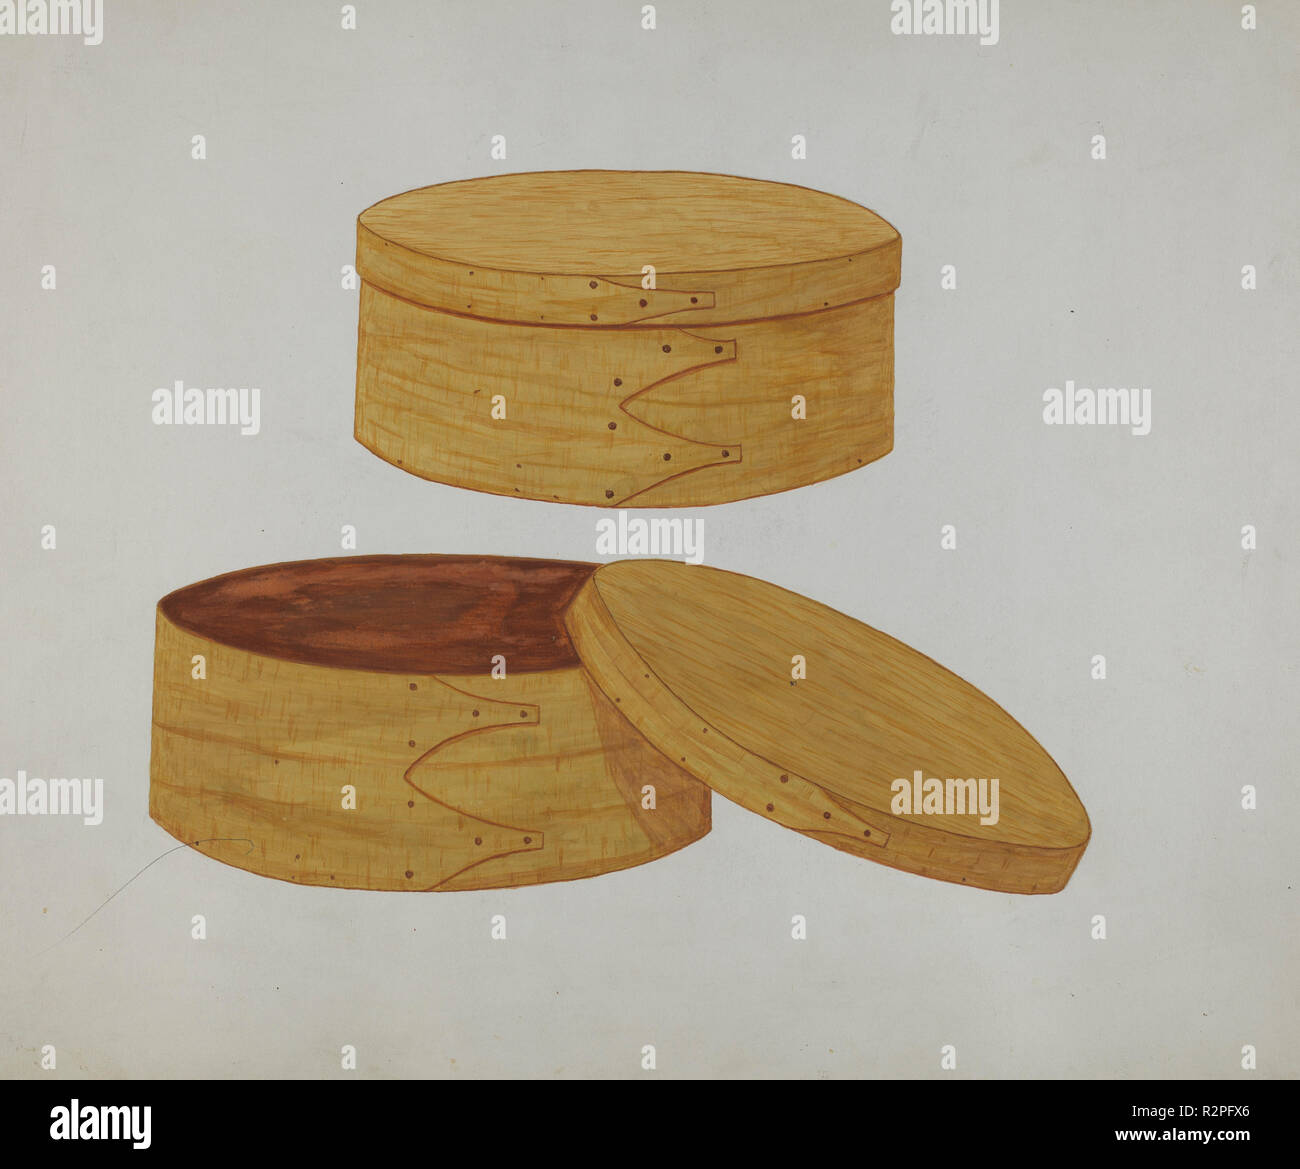 Lumber ramrods scene 2